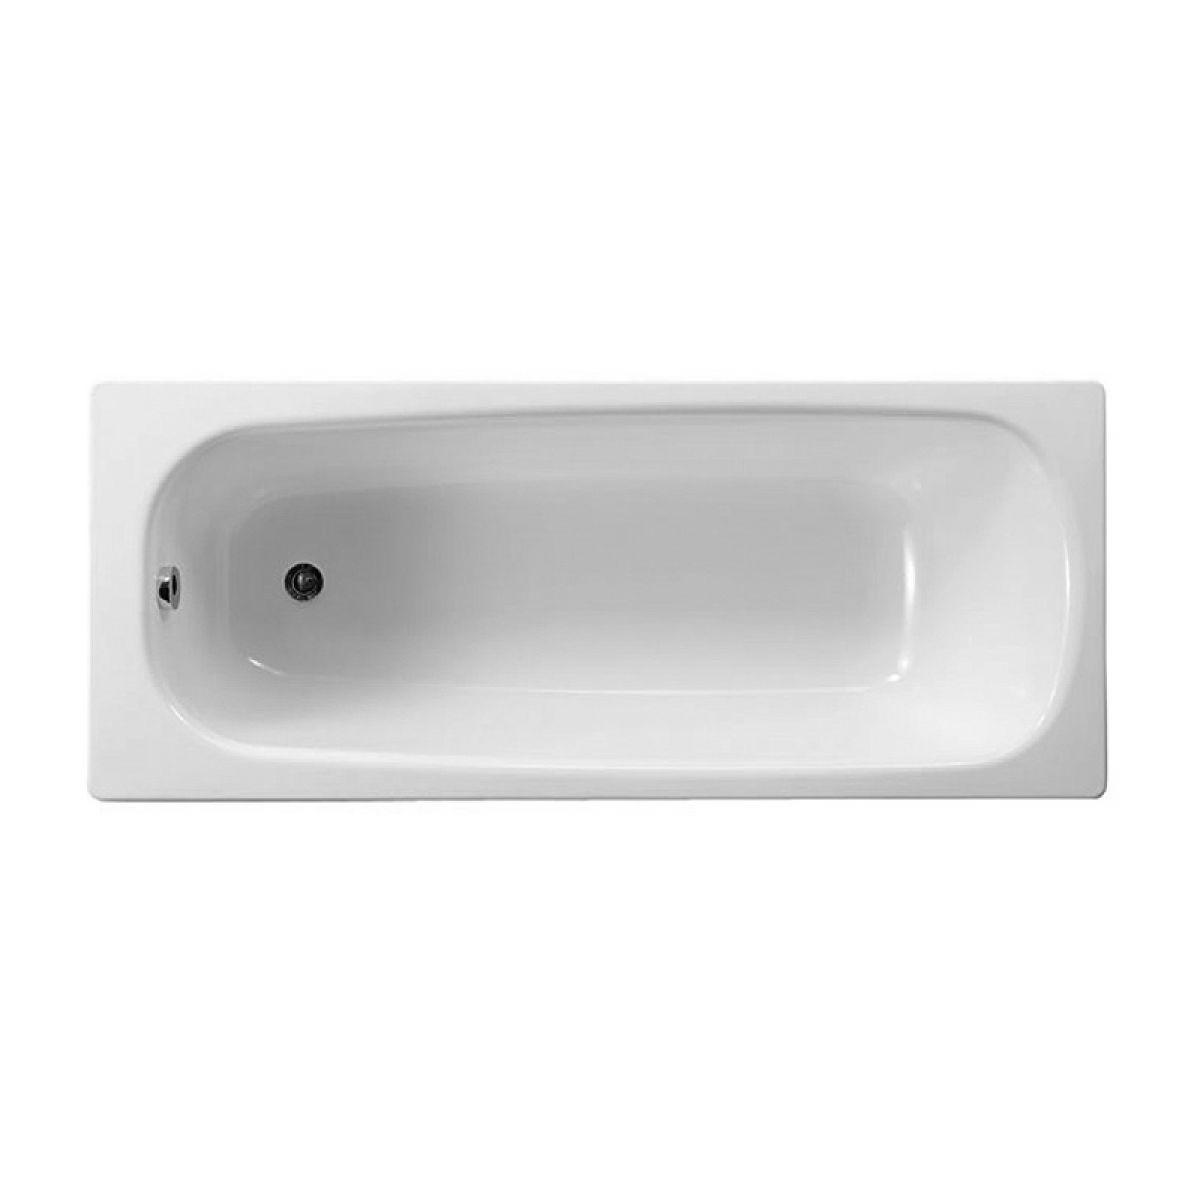 Roca contesa eco steel bath 1700 x 700mm uk bathrooms for Bath 1200